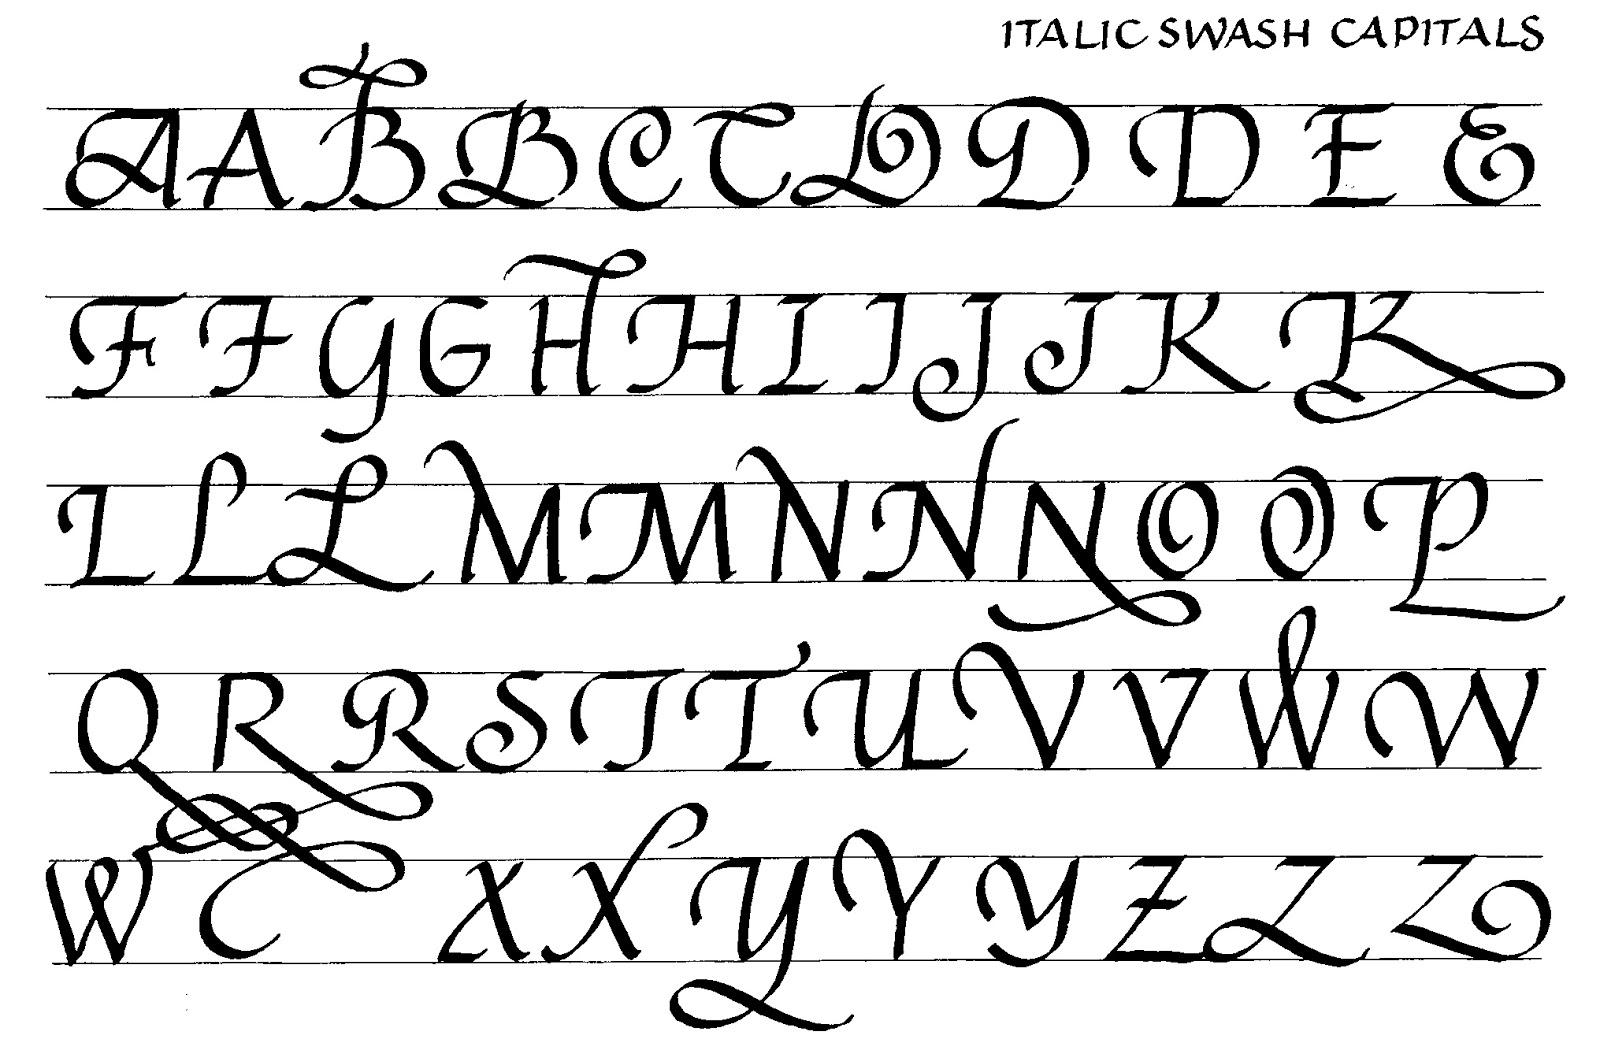 Margaret Shepherd Calligraphy Blog 170 Swash Italic Capitals With Options